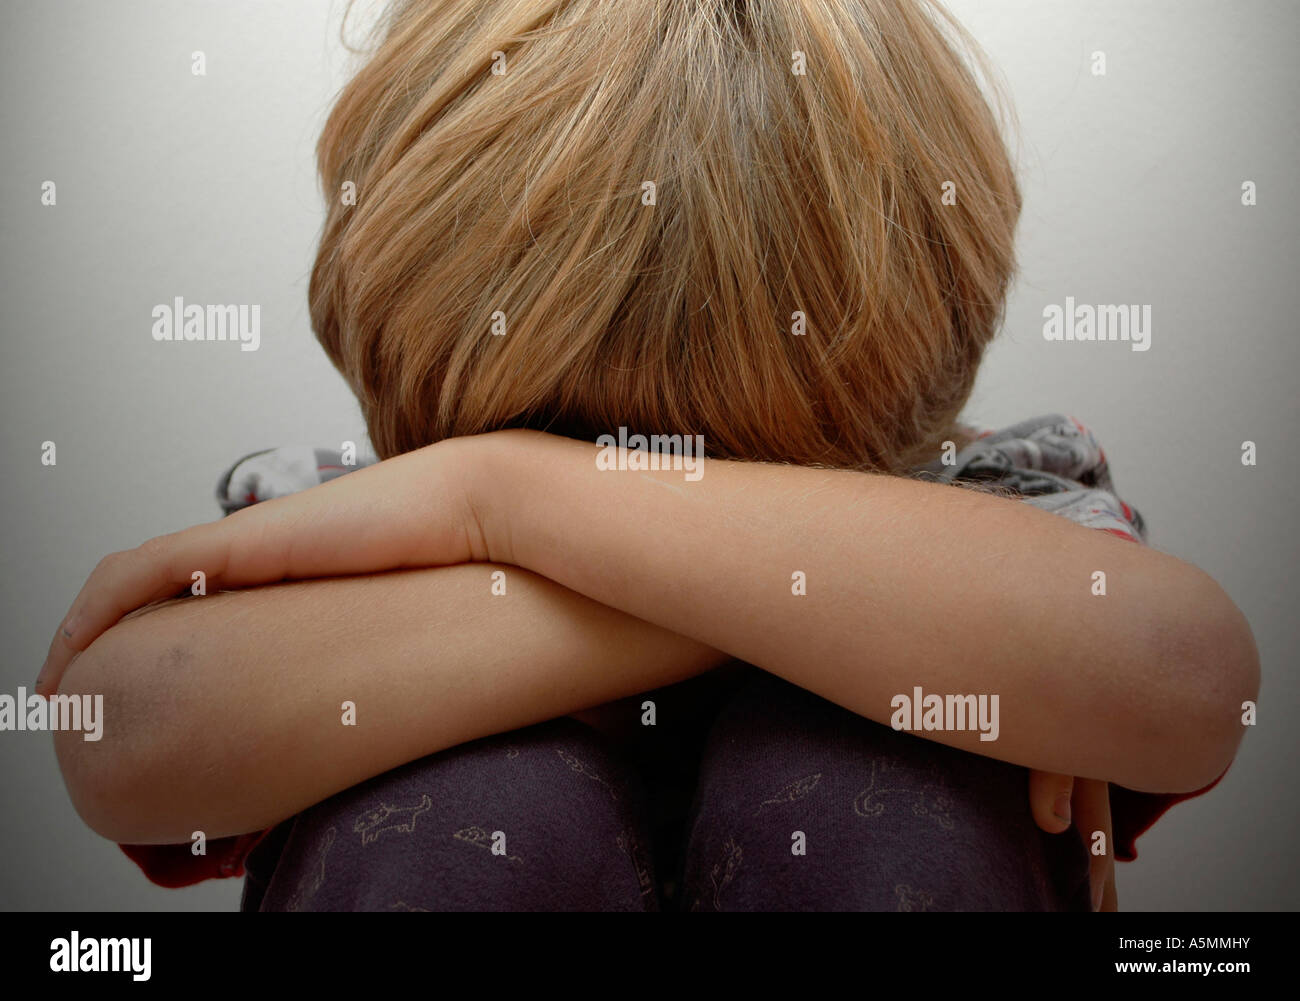 Symbolbild Kindesmissbrauch symbolic for child molestation Kind Menschen Mensch Personen Leute people jung kindlich Kinder Kindh Stock Photo